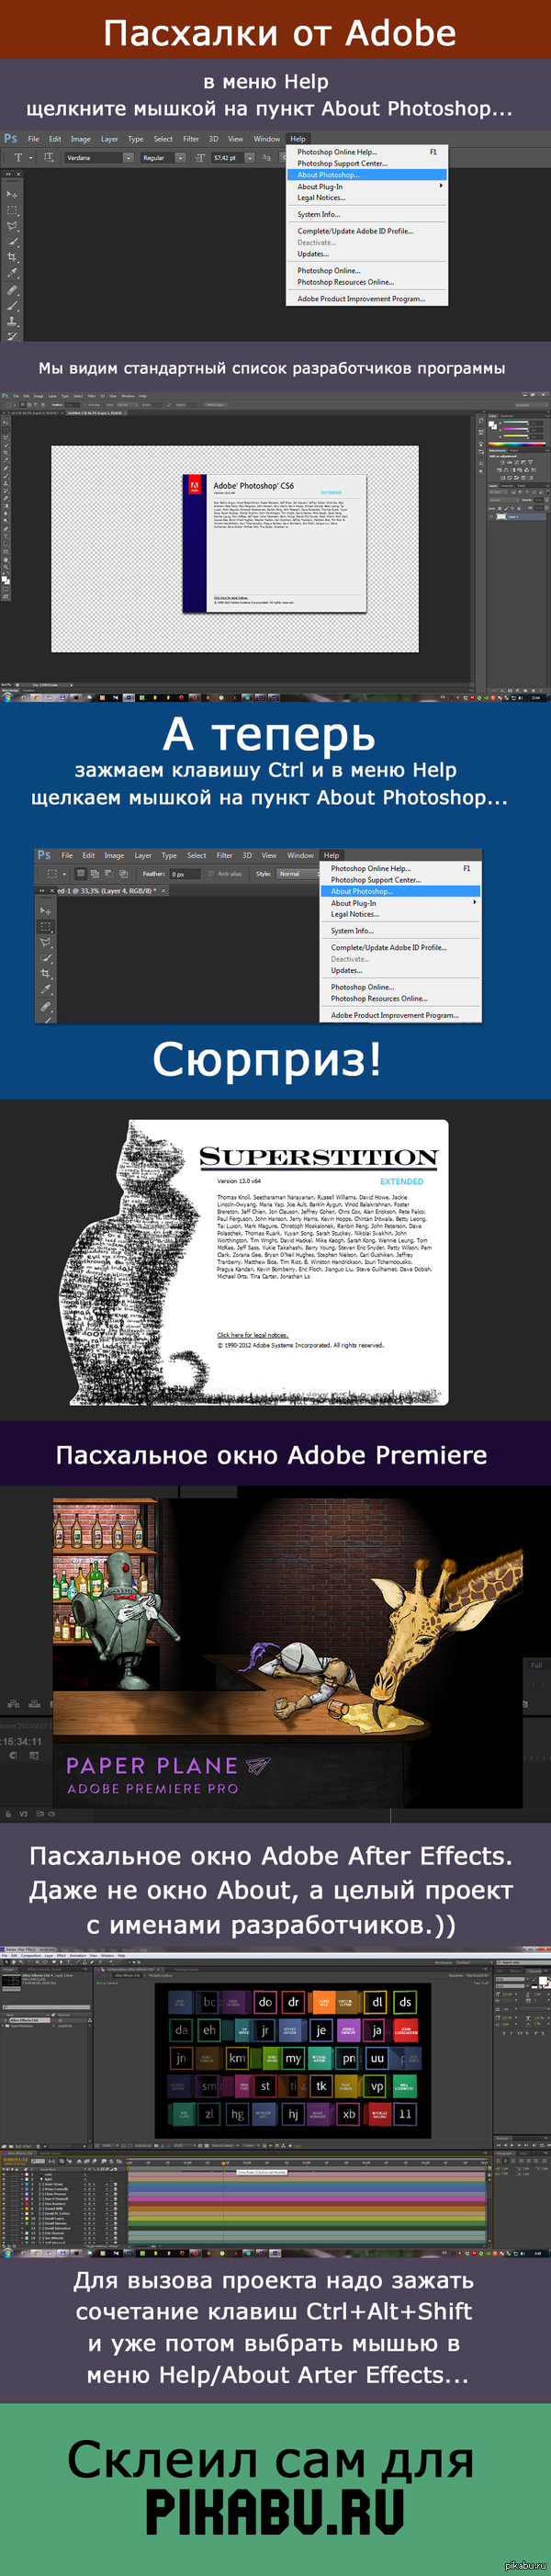 Пасхалки от Adobe